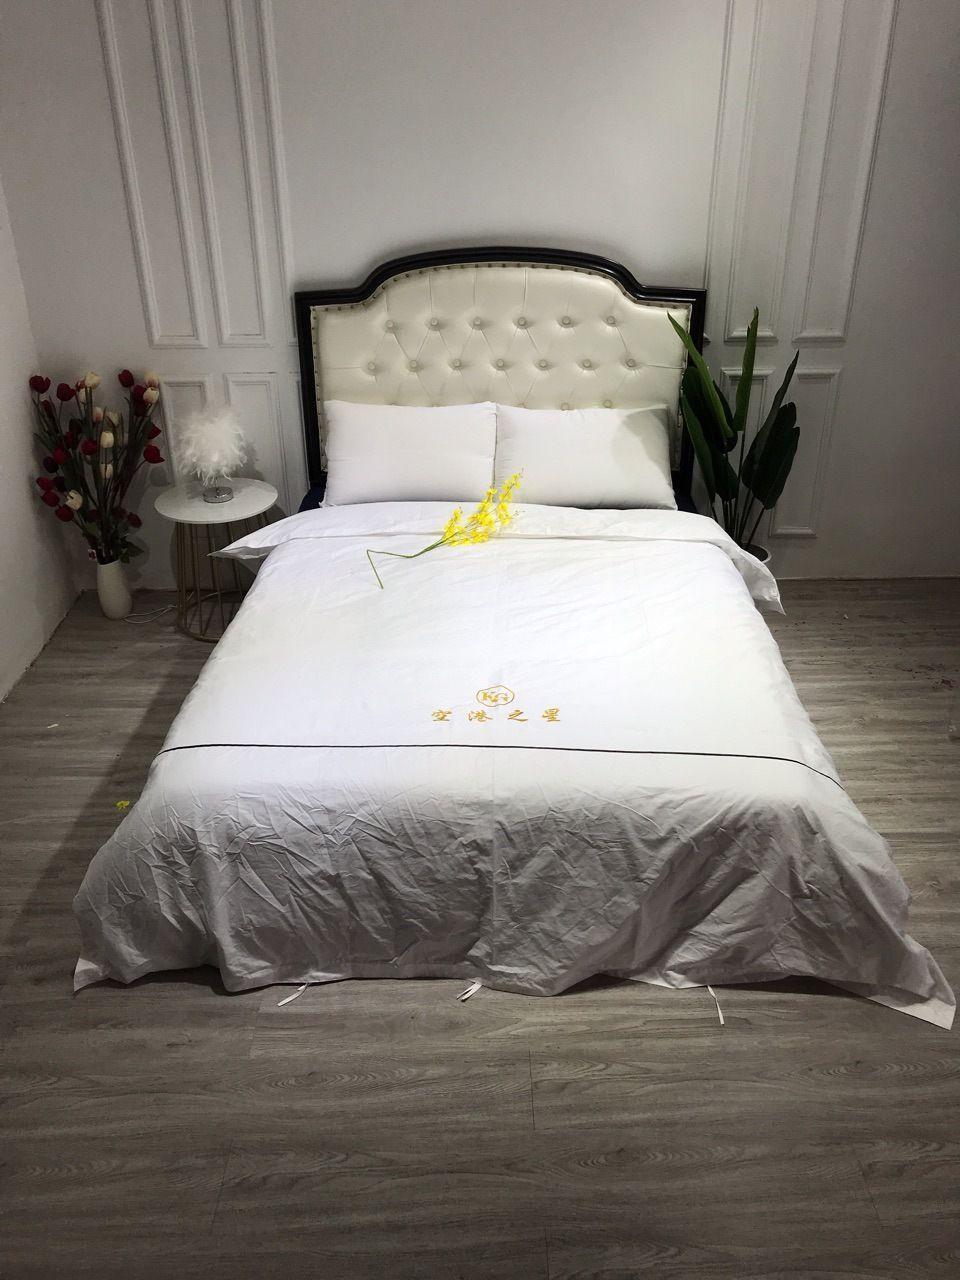 Hotel Hotel Cotton Satin Four-Piece Set 60 Jet Cotton Embroidered Logo Processing Customized 4-Piece Set